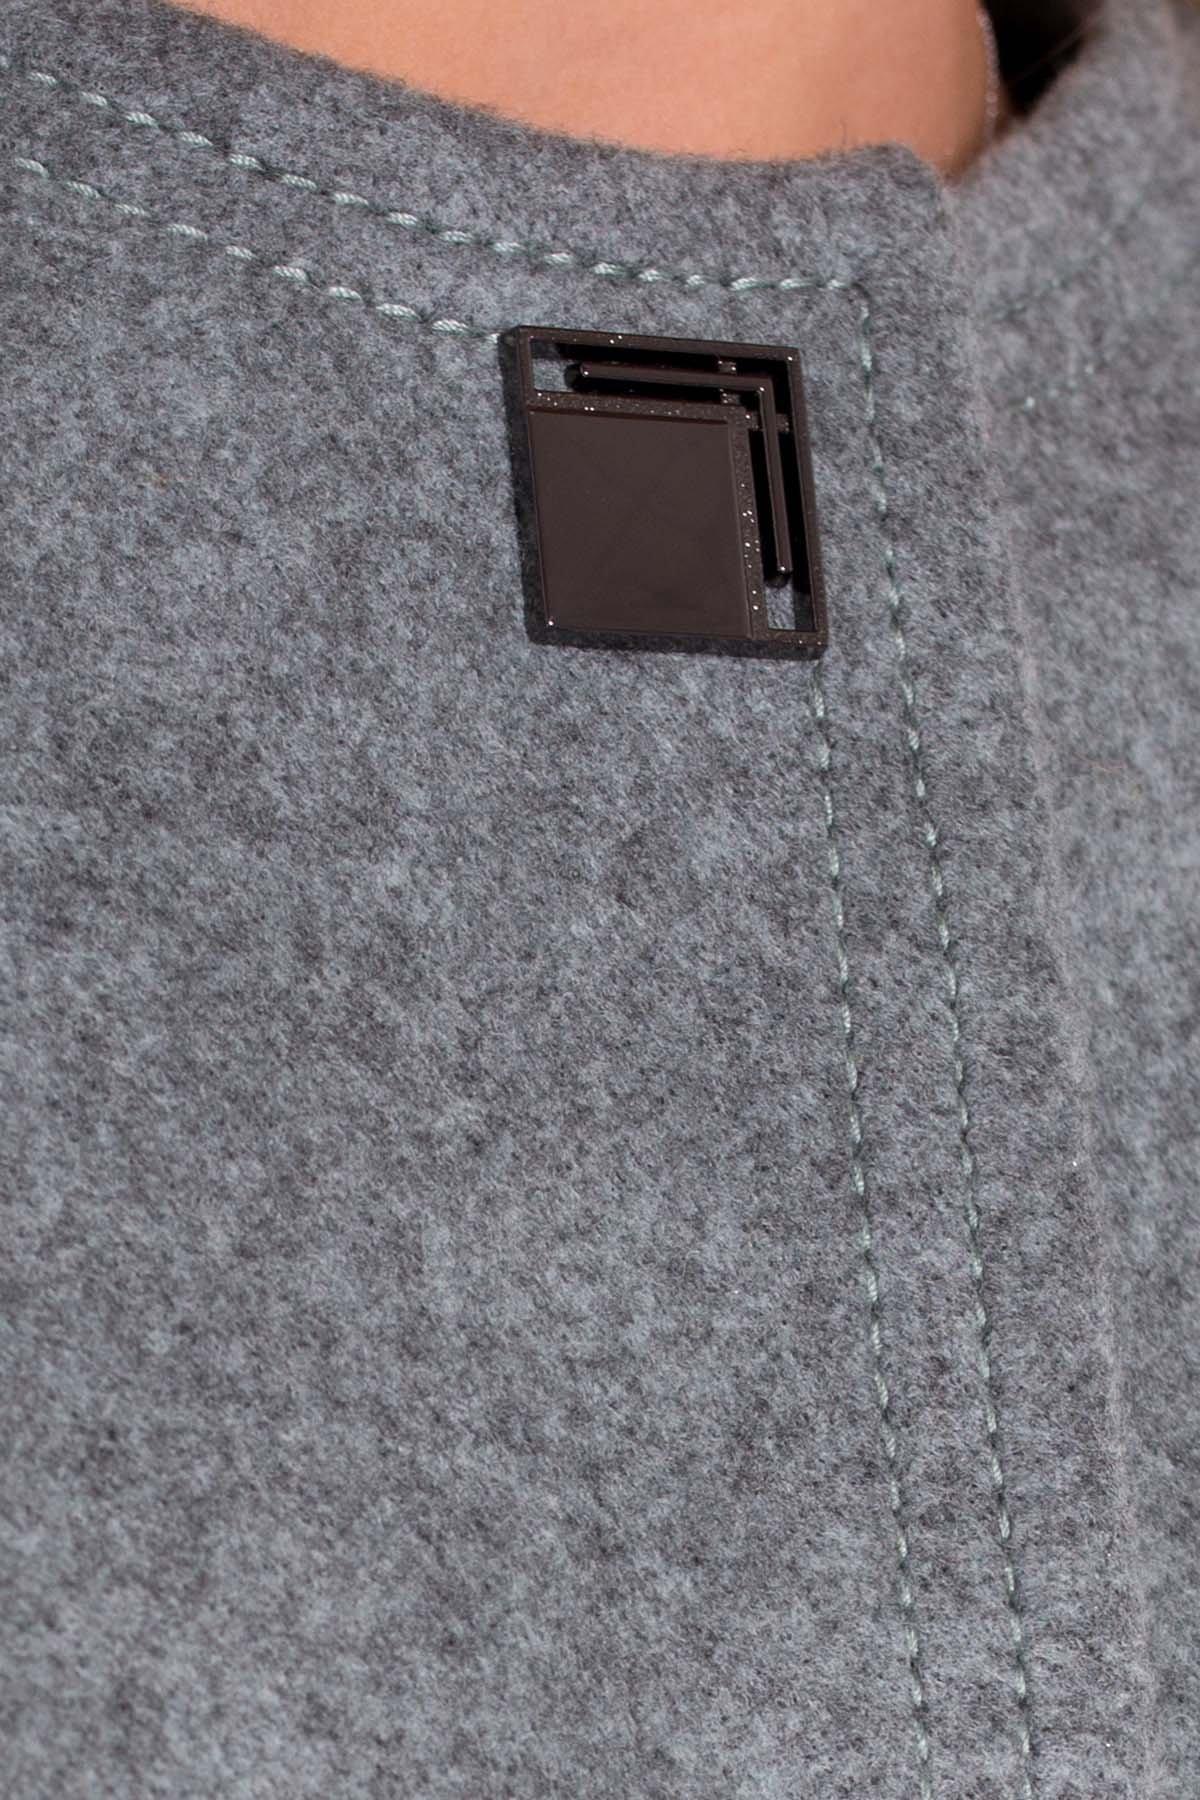 Демисезонное пальто Ферран 5369 АРТ. 37437 Цвет: Олива - фото 5, интернет магазин tm-modus.ru